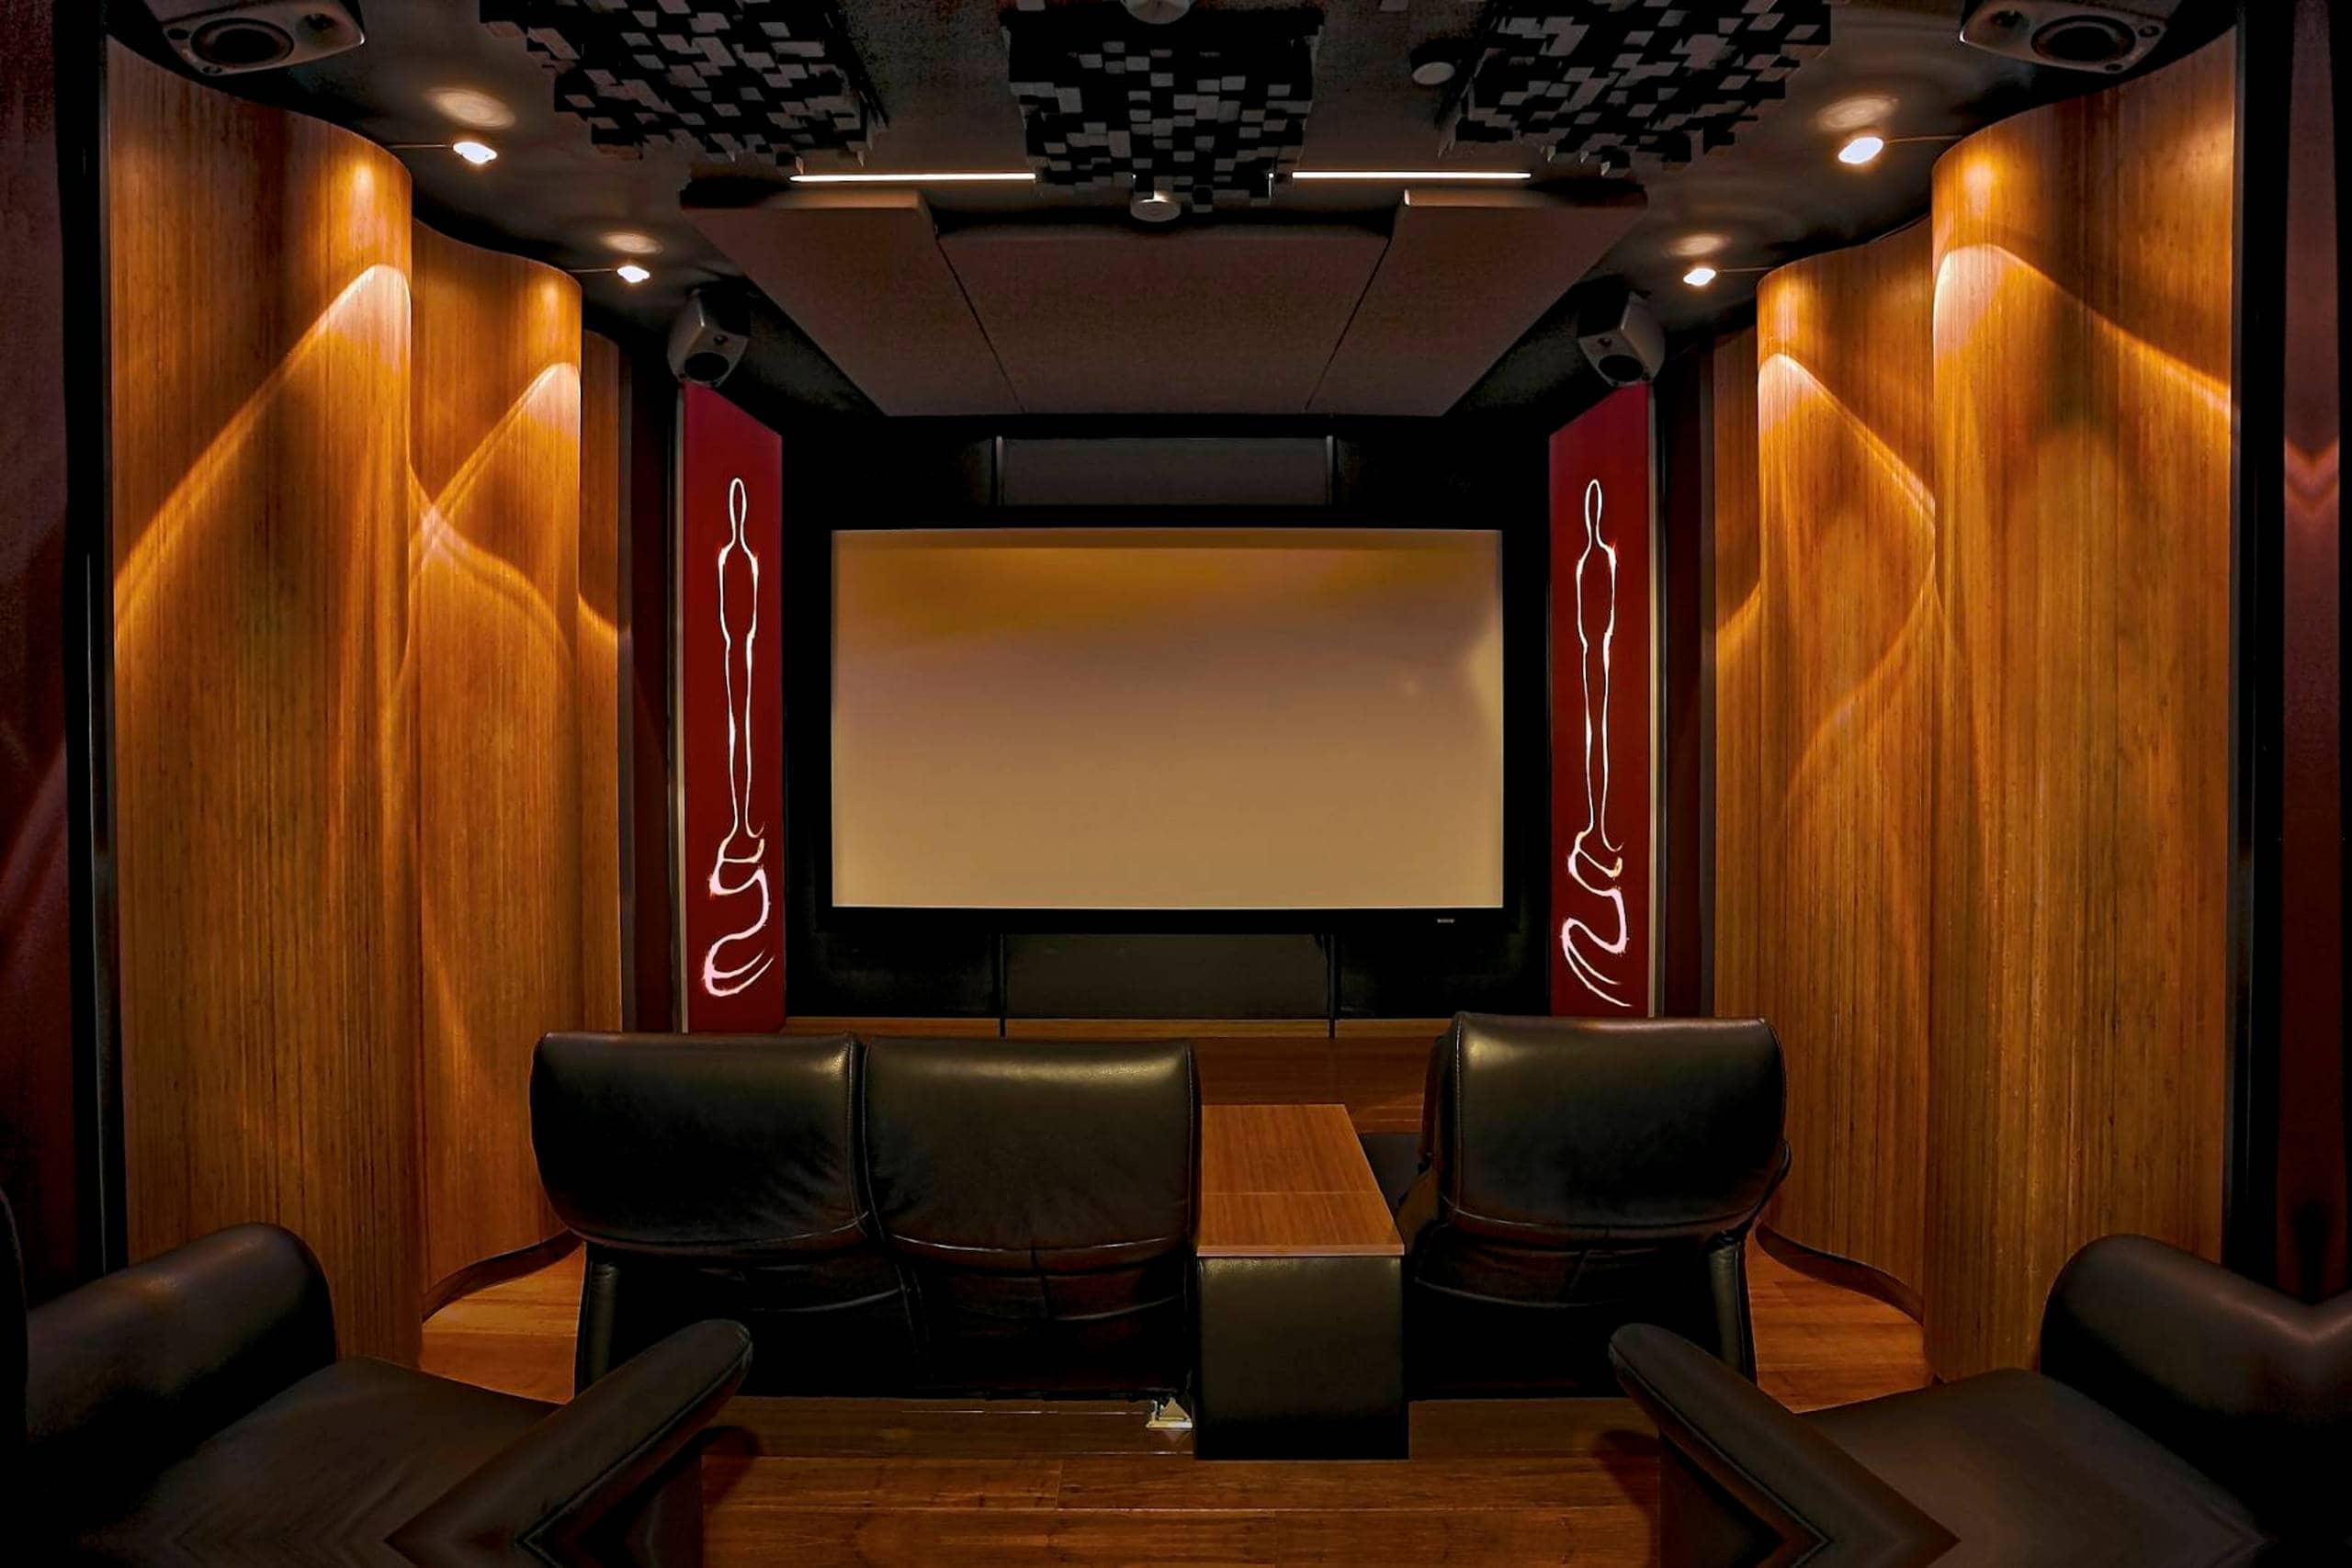 Home Cinema Wave Maxx - mbakustik I Büro für Raumakustik